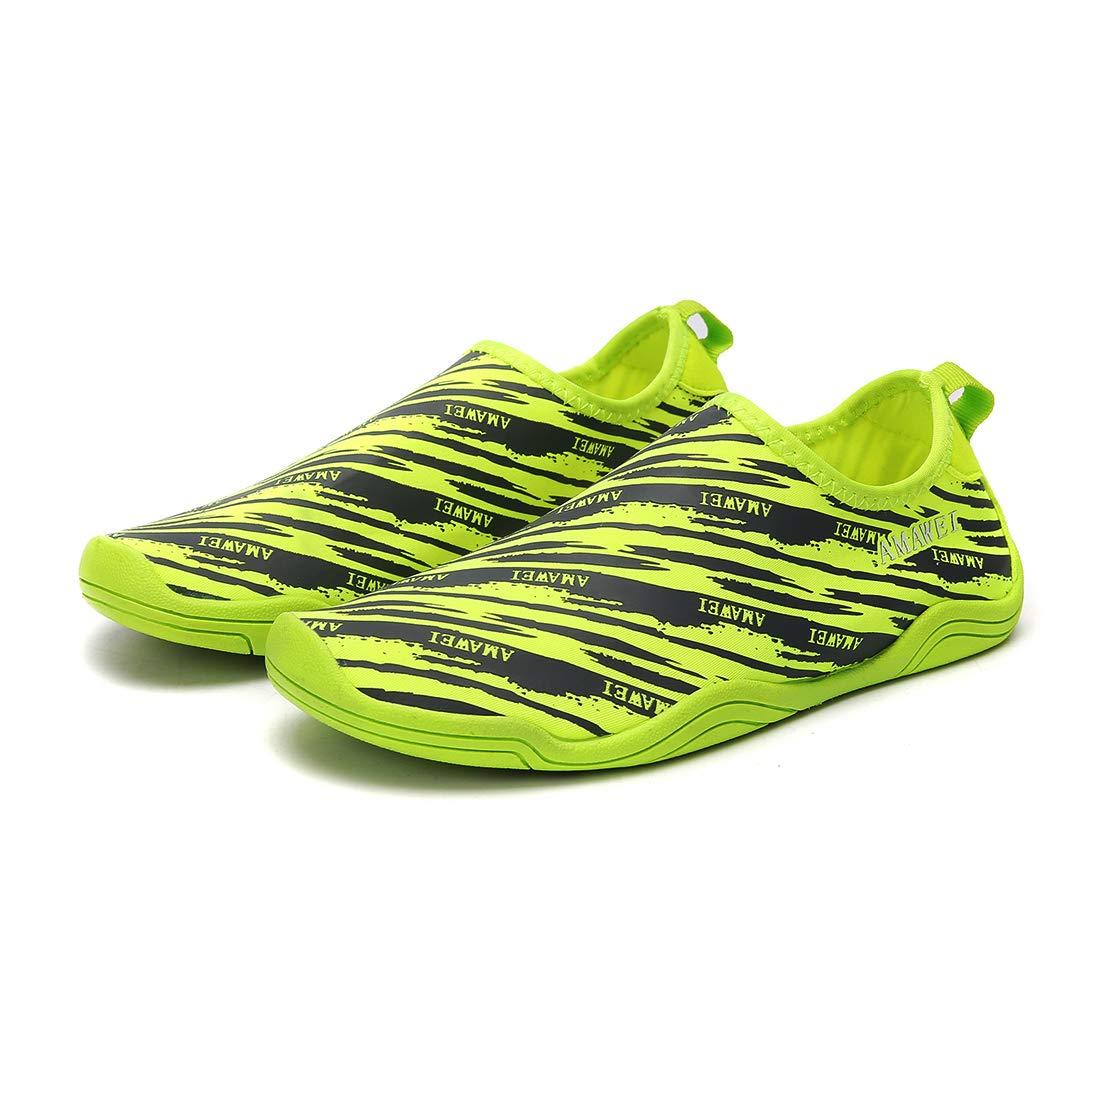 VAMV Water Shoes for Kids Boys Girls Beach Swim Shoes Slip On Aqua Sock